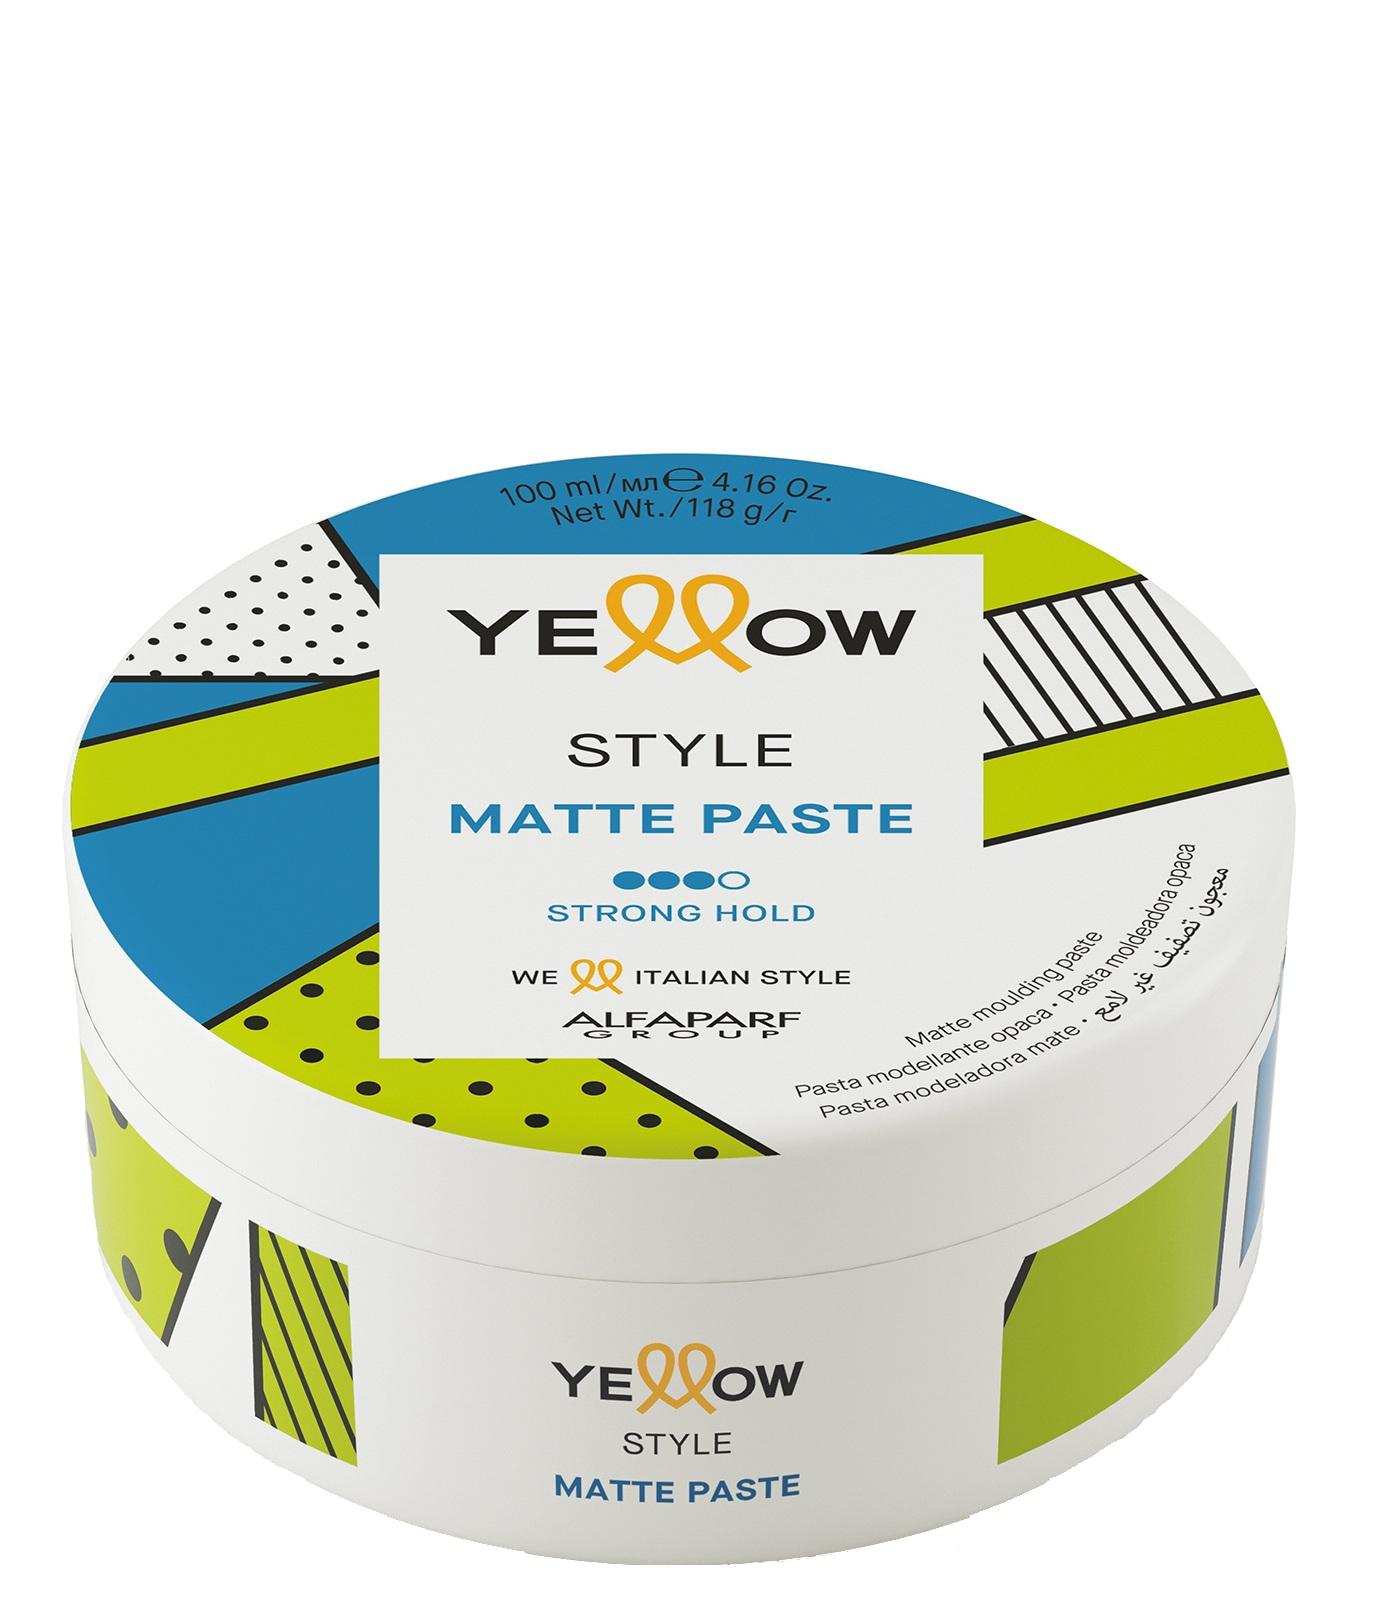 Купить YELLOW Паста матирующая сильной фиксации / YE STYLE MATTE PASTE 100 мл